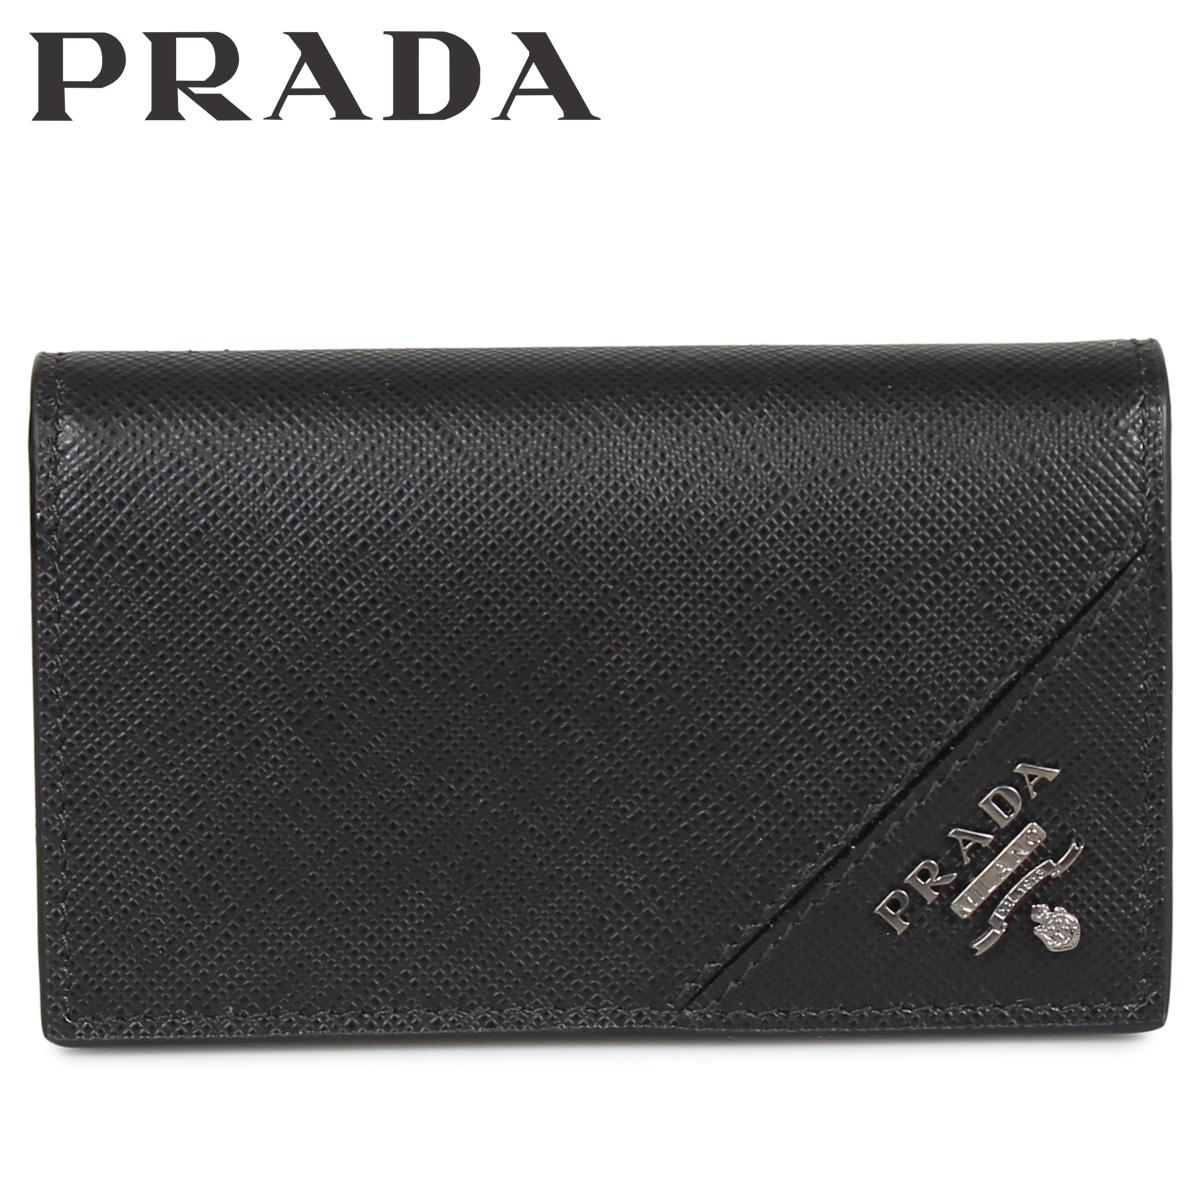 PRADA BUSINESS CARD HOLDER VOFTM プラダ 名刺入れ カードケース カードホルダー メンズ サフィアーノ ブラック 黒 2MC122QME